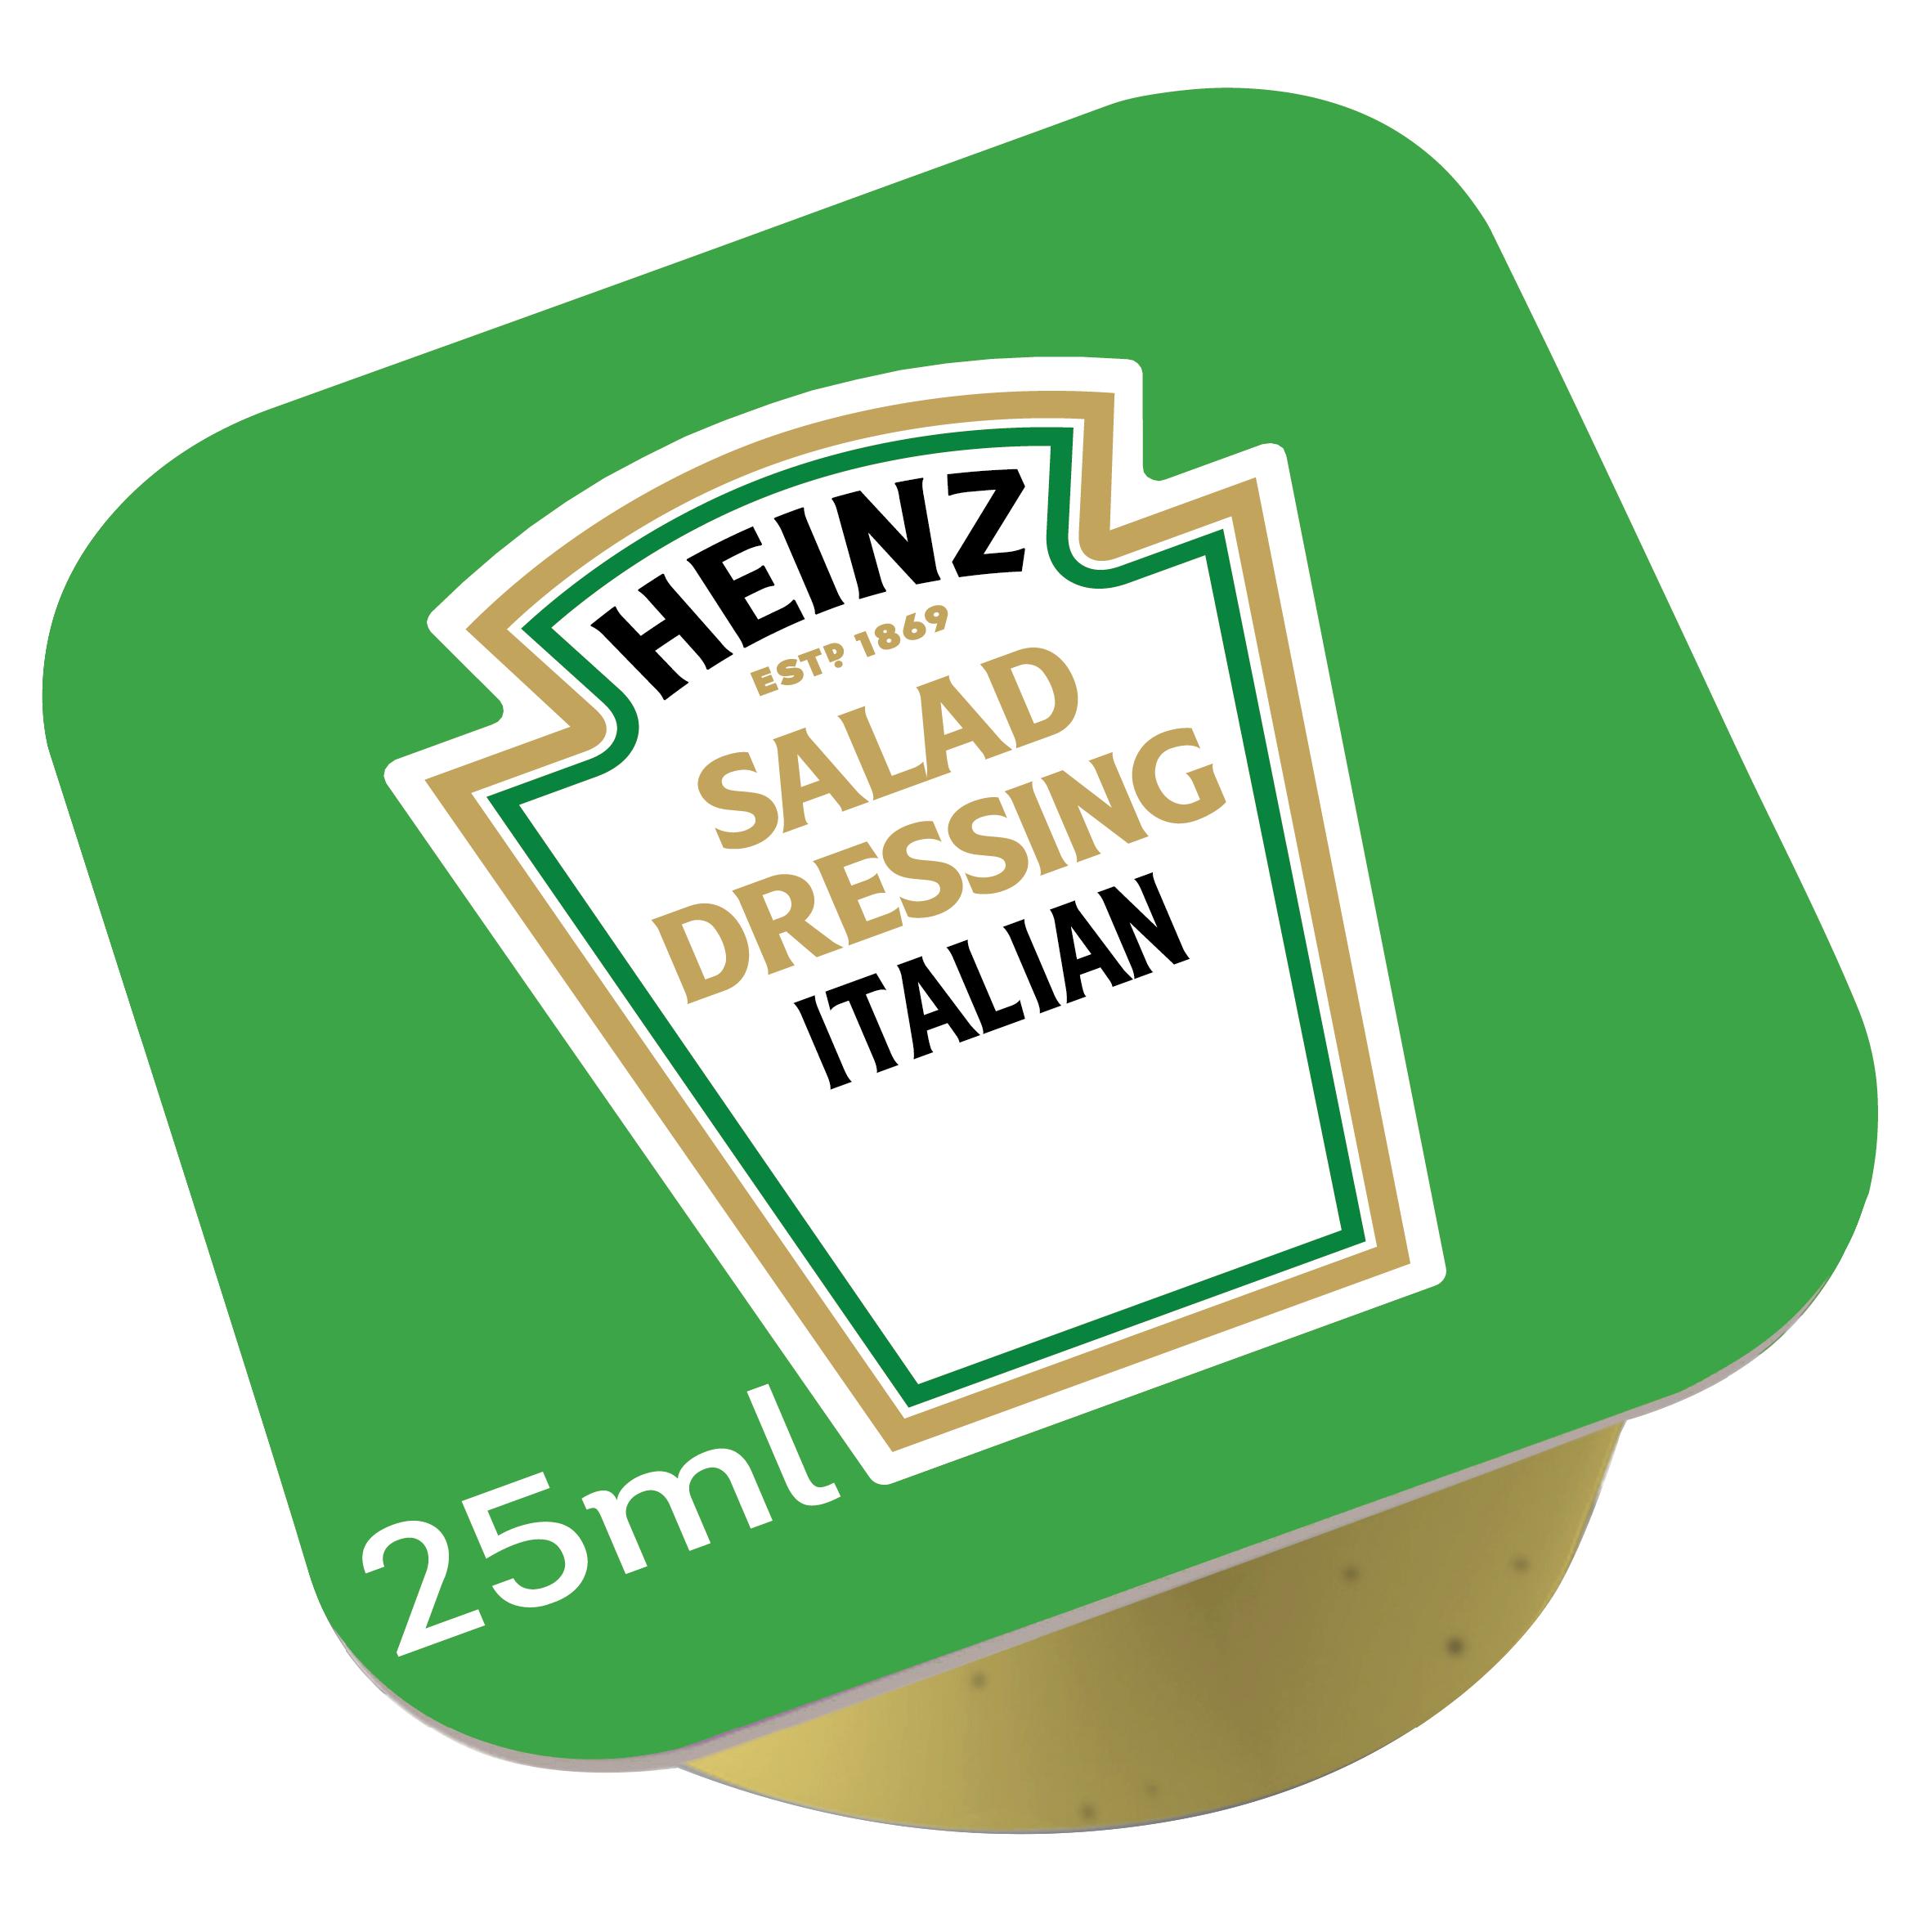 Heinz Italian Dressing dippot 25ml image